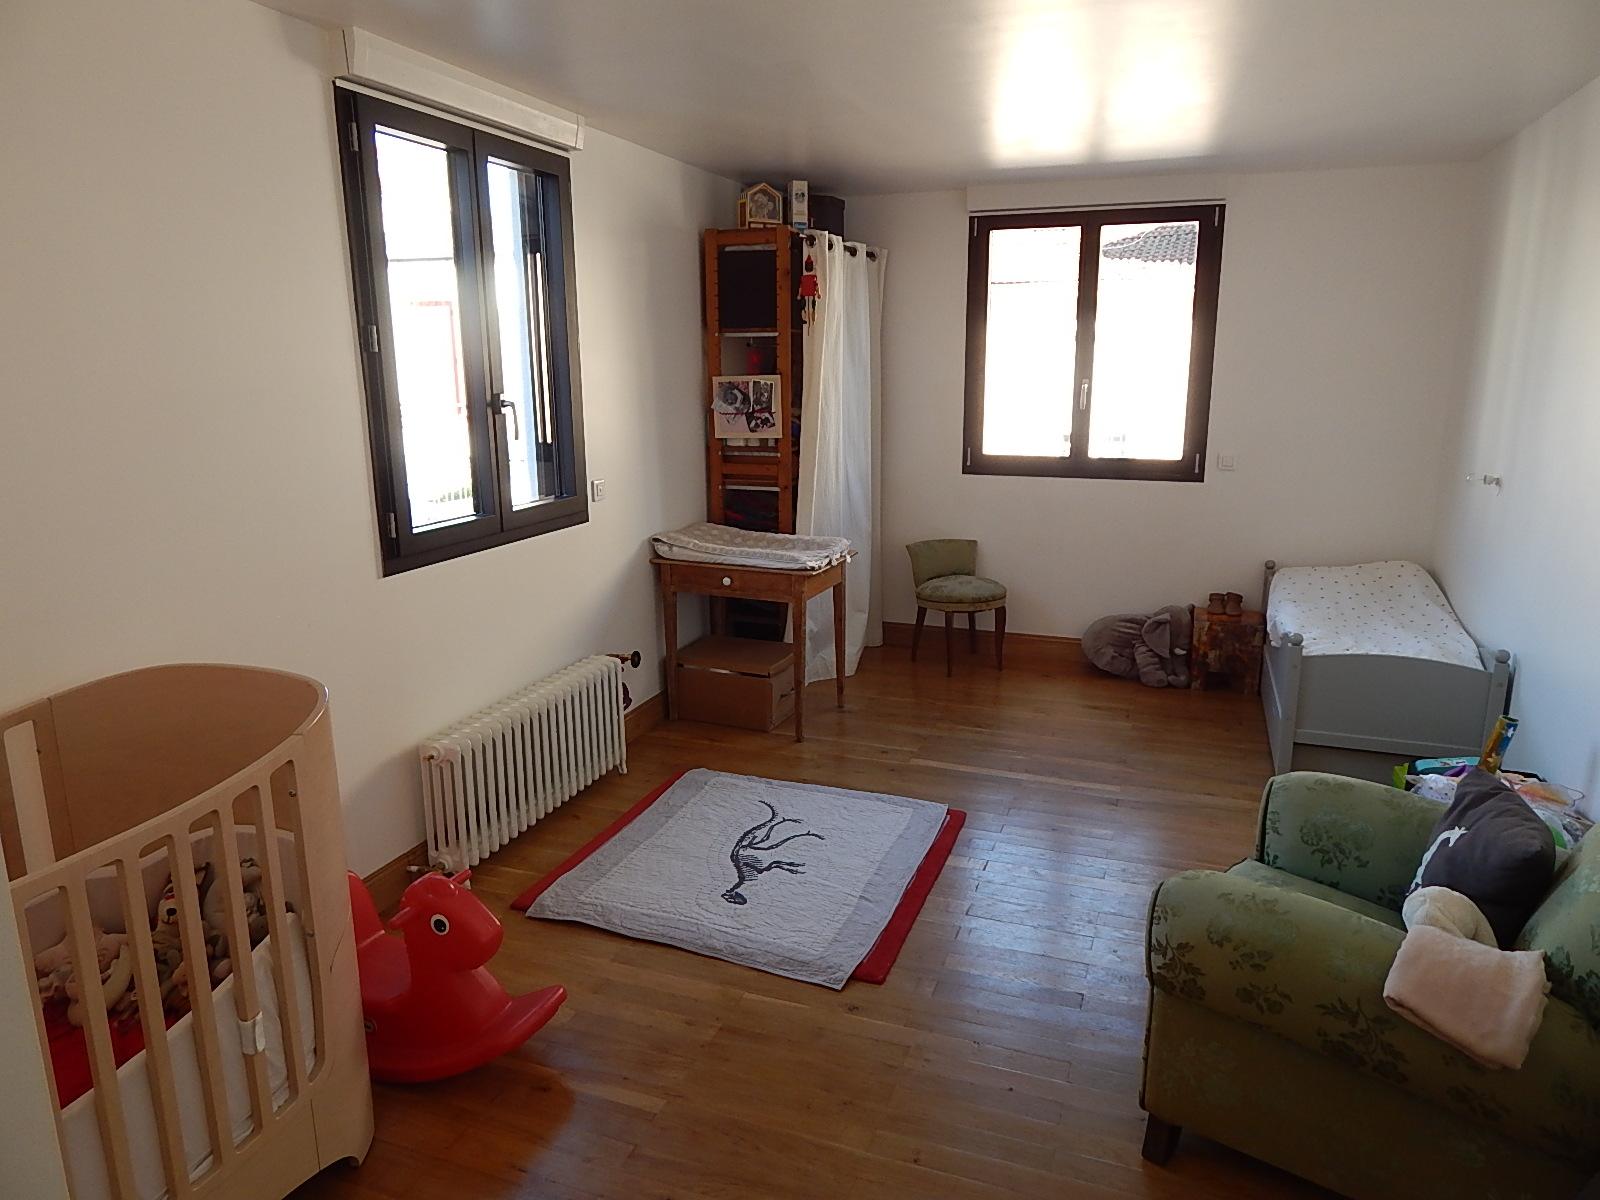 13-Chambre_St Ouen.JPG